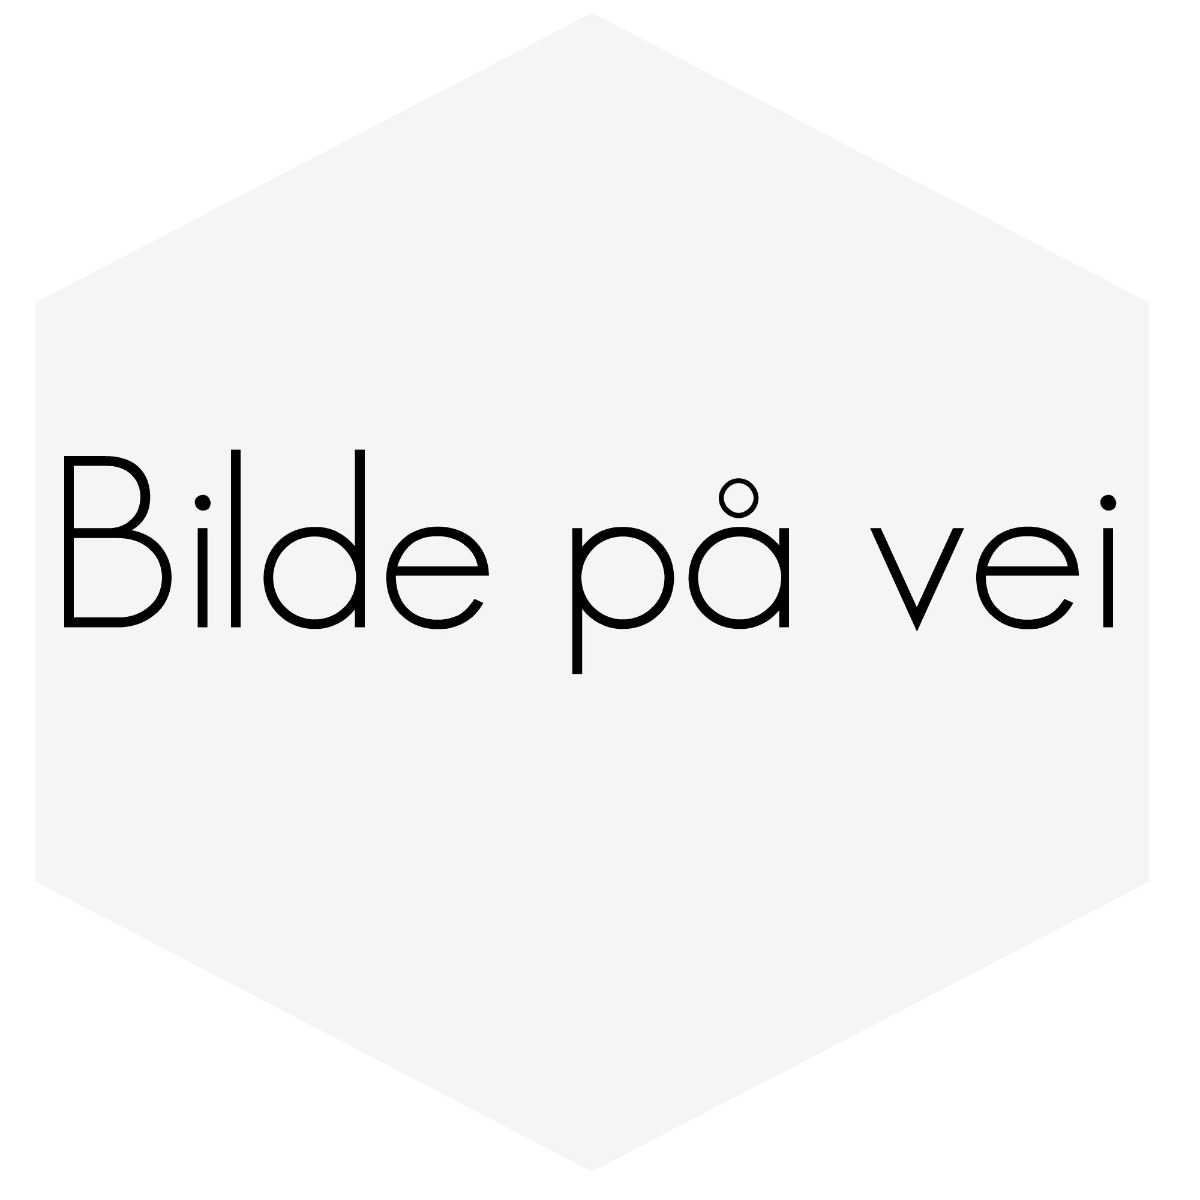 ØYELOKK 940 I FIN ABS PLAST  ,KAN LAKKES